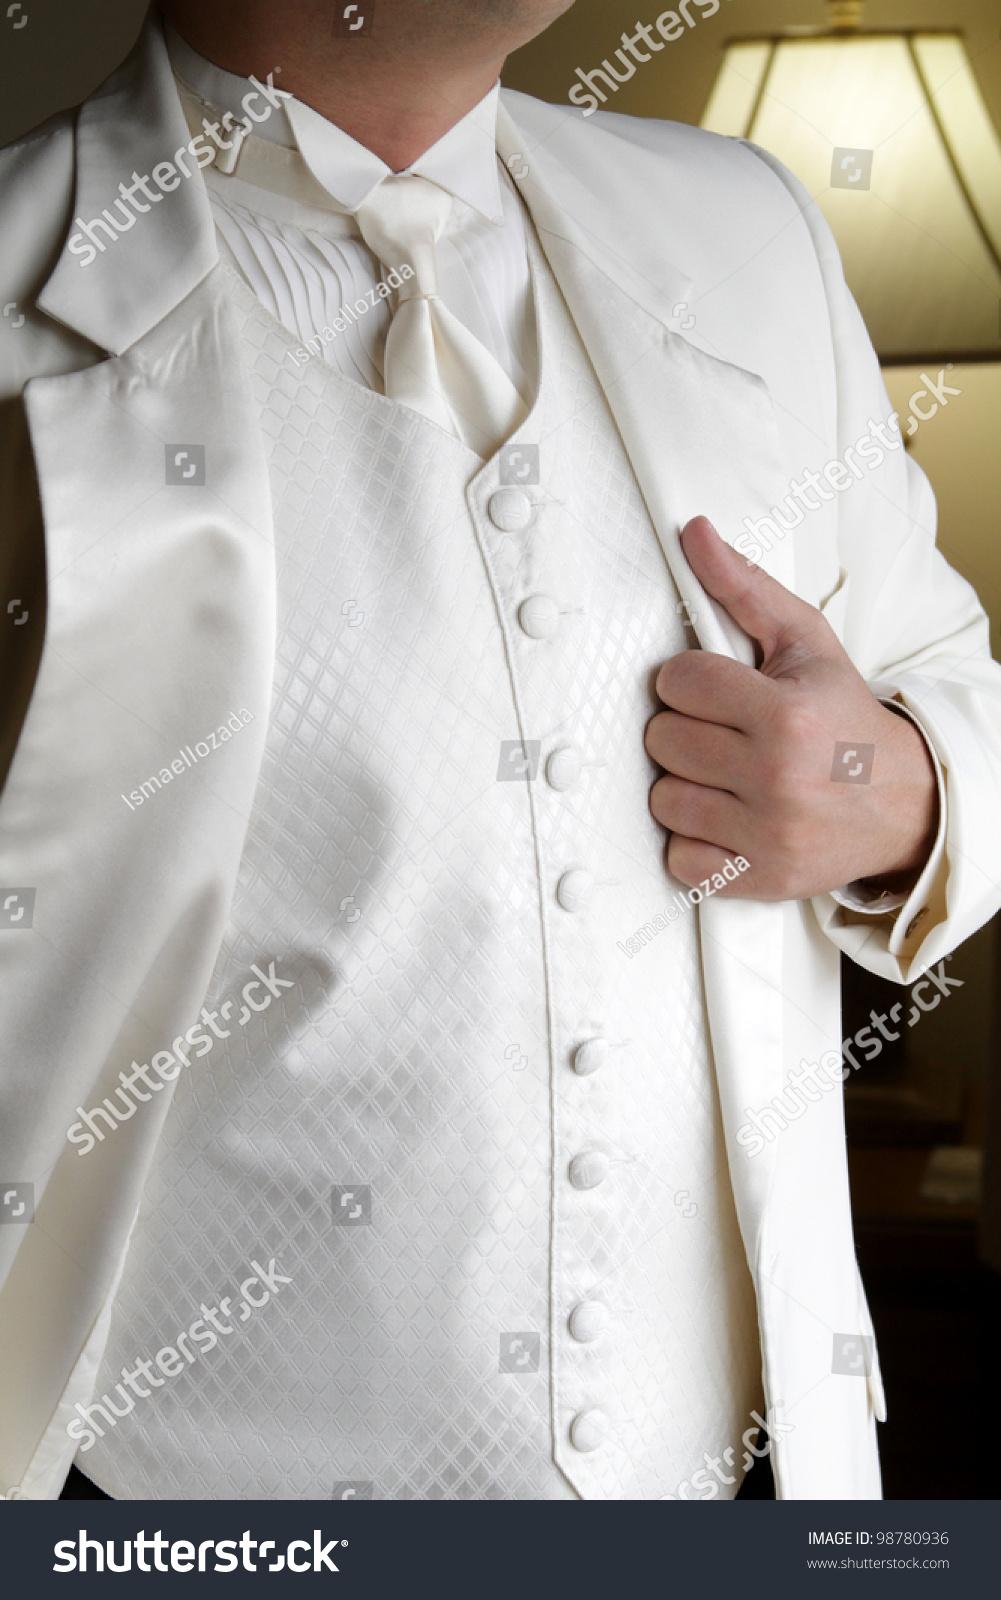 Tuxedo Standing Groom White Tuxedo Image Stock Photo 98780936 ...